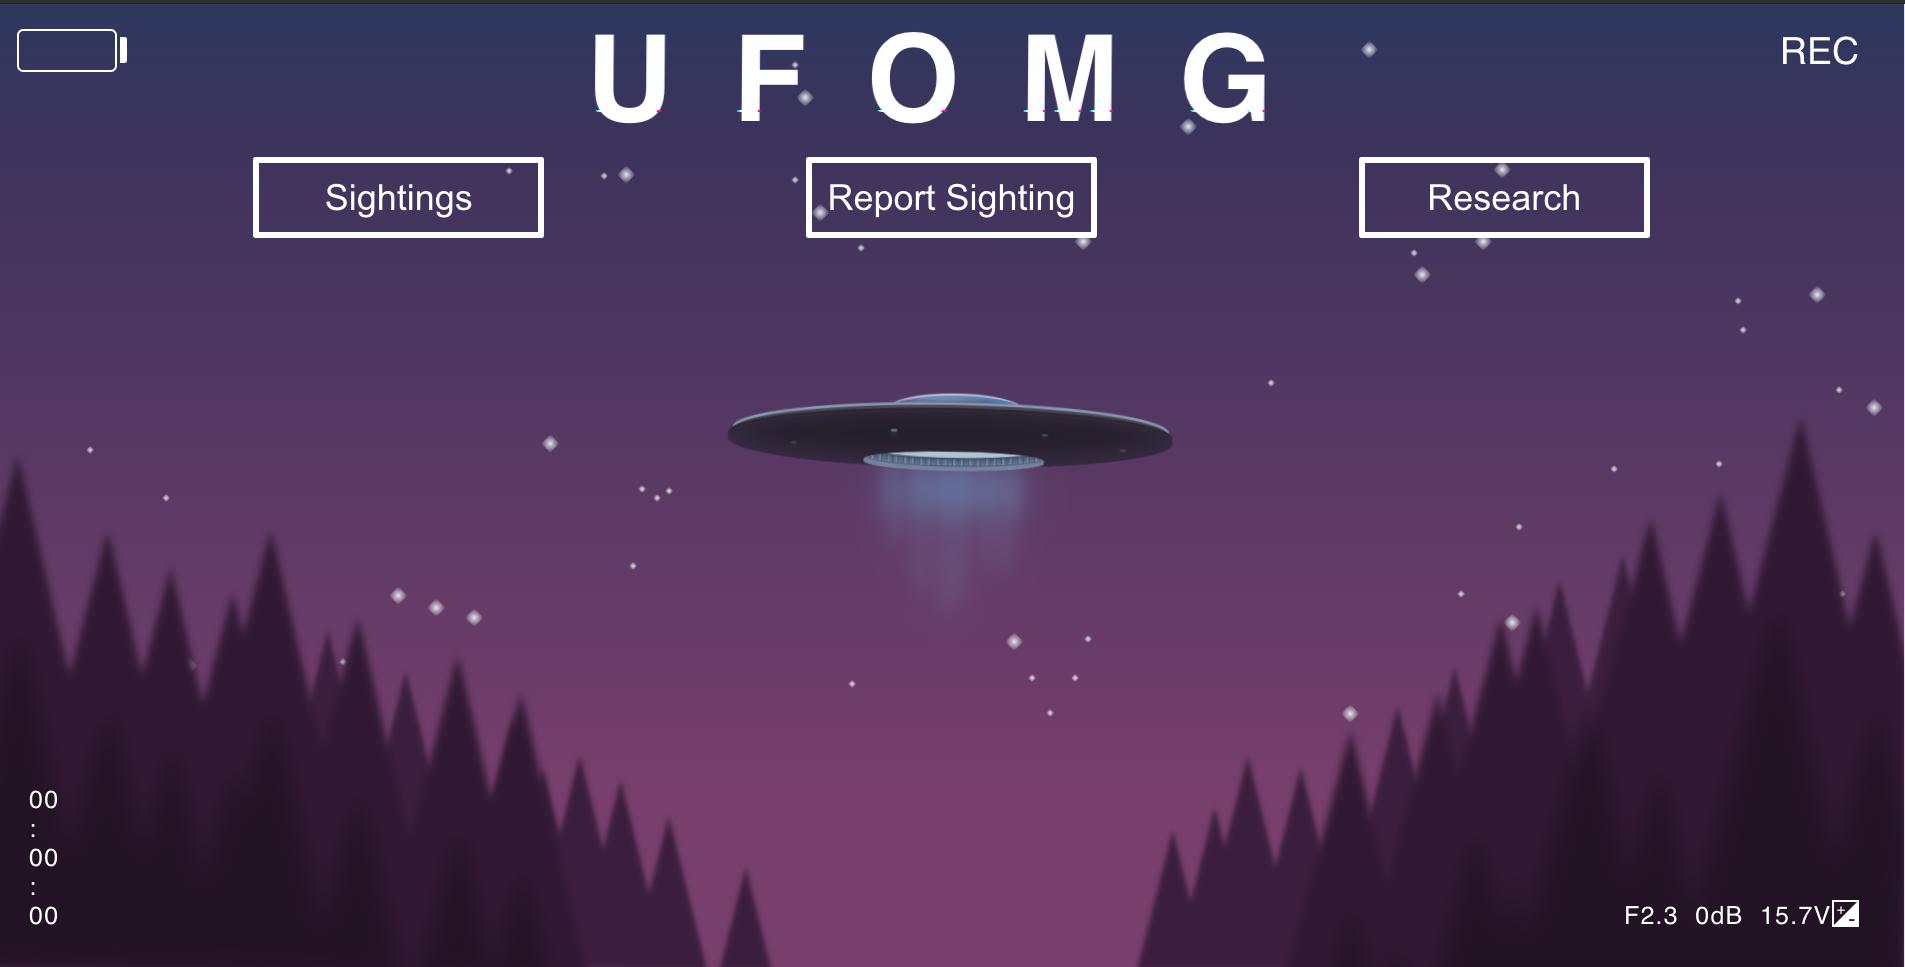 UFO sighting reporting application